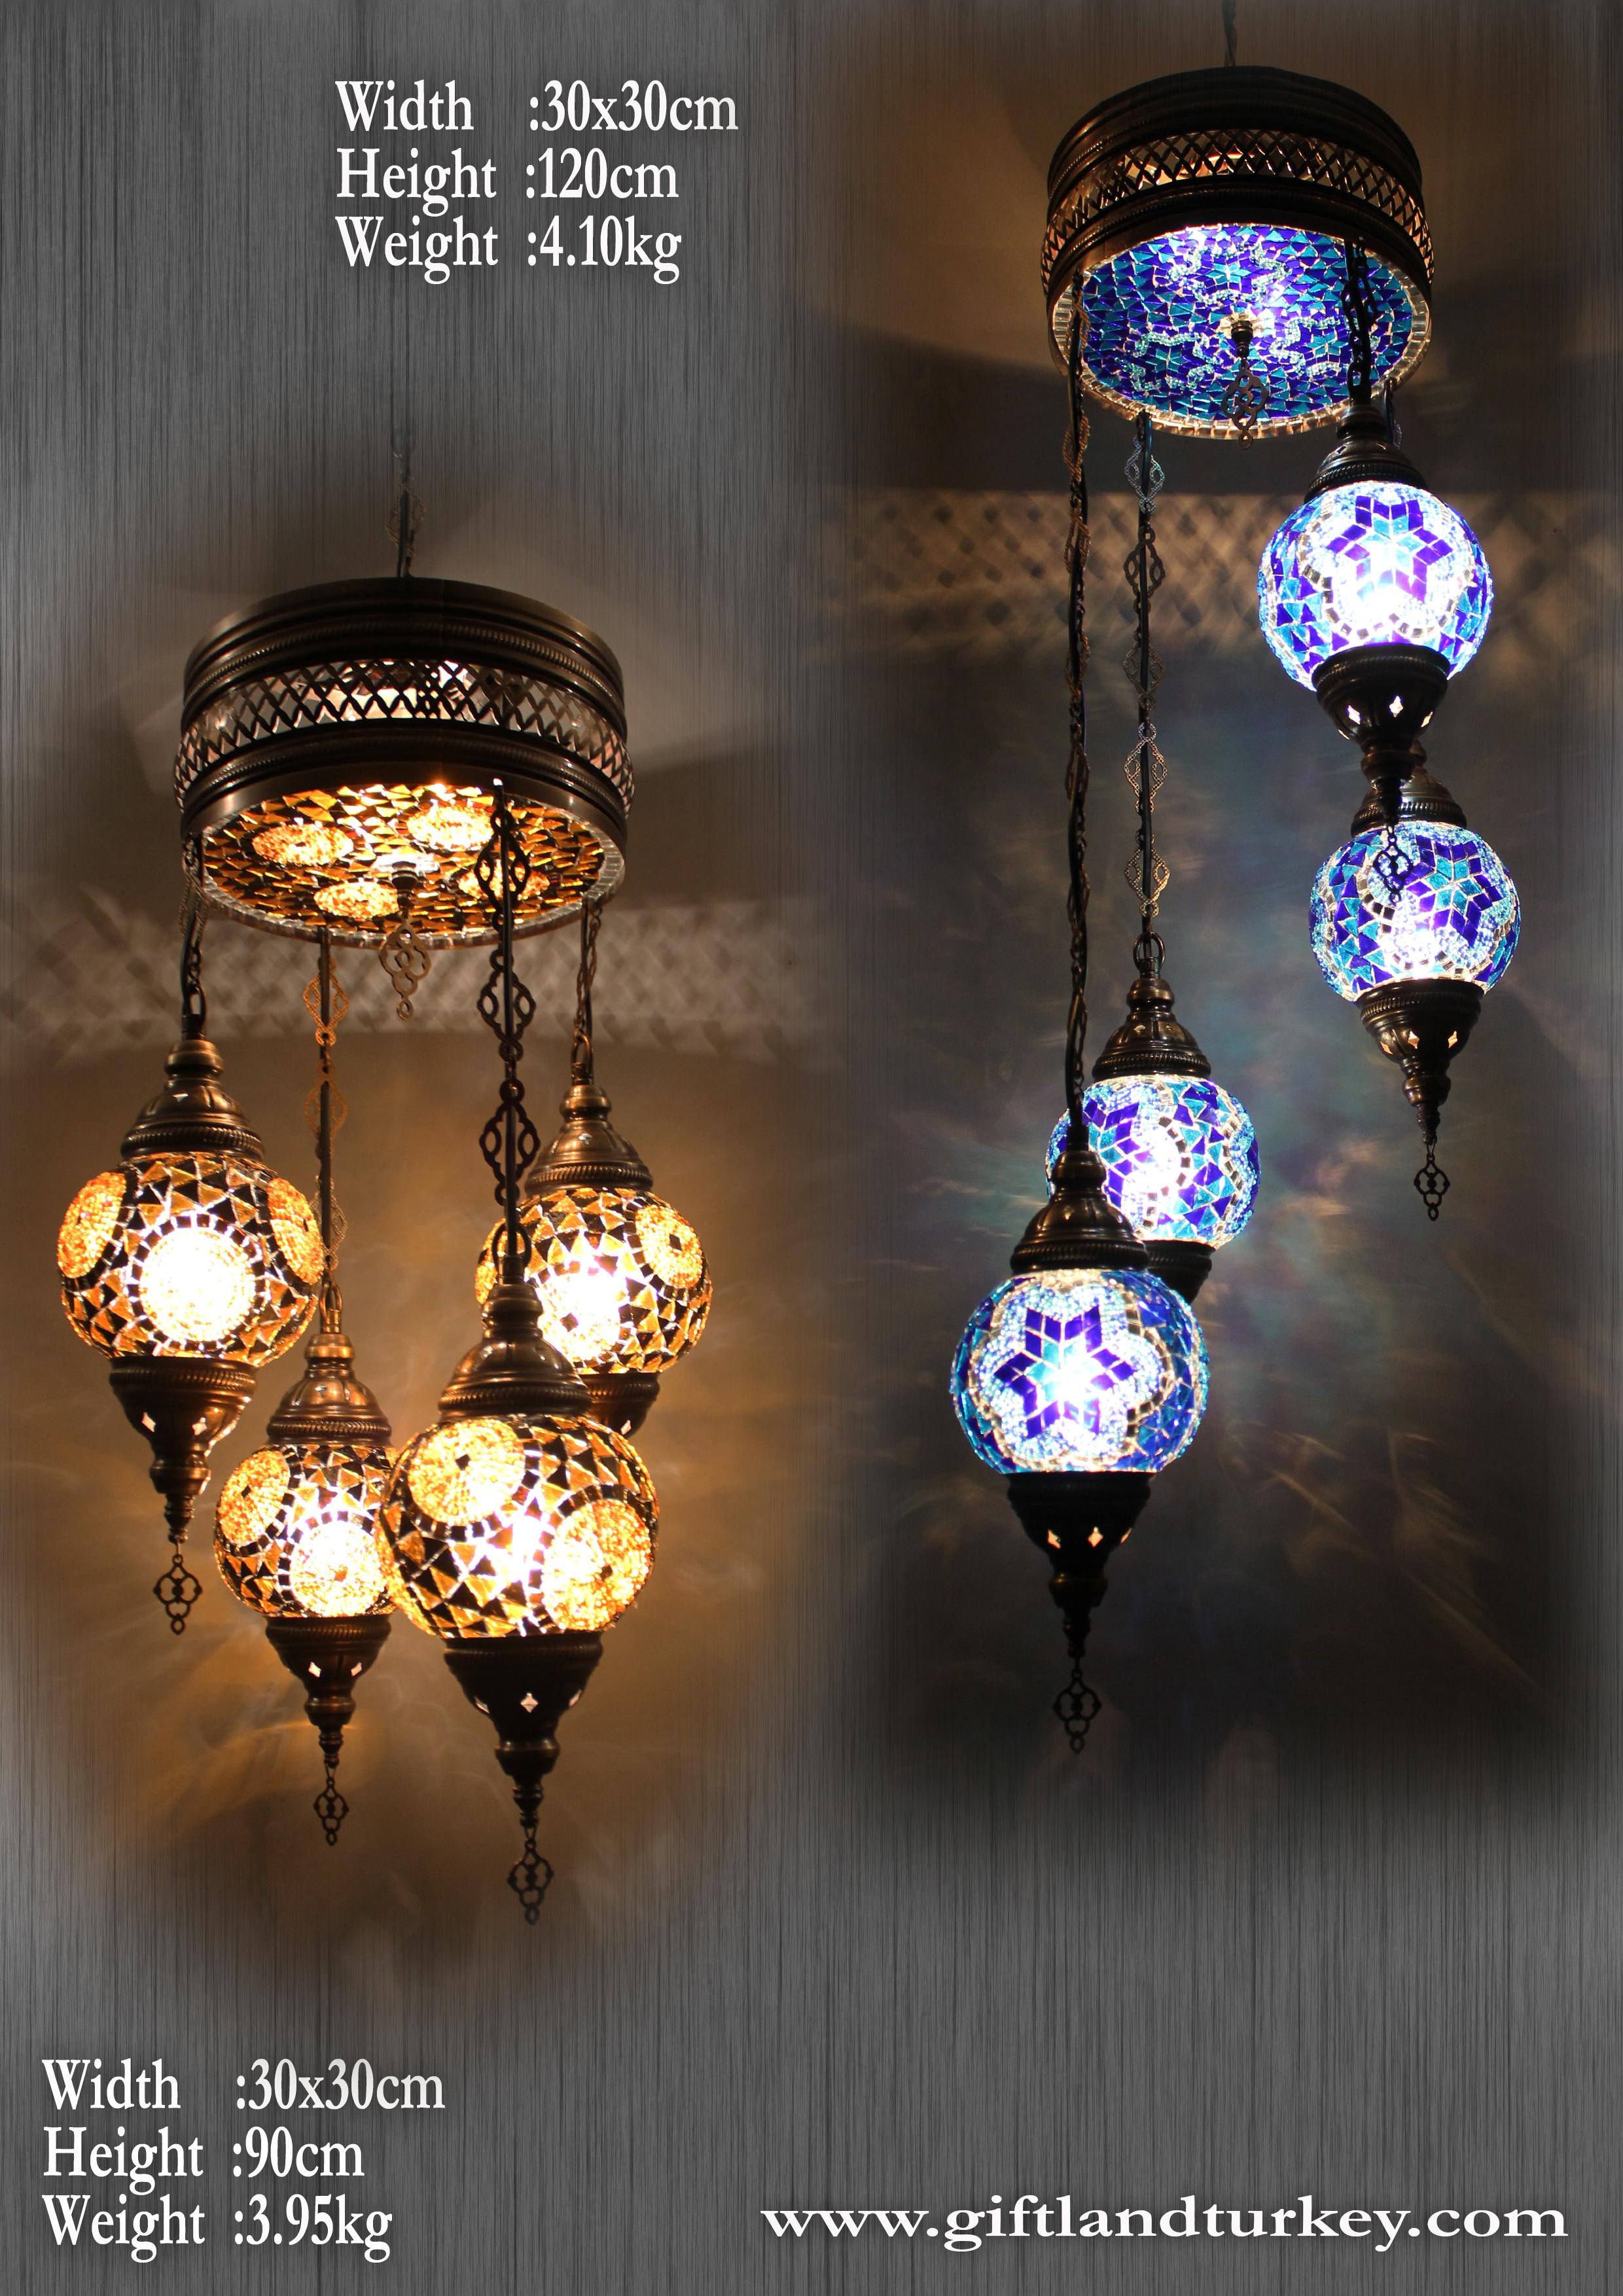 Turkish Mosaic Lamp make you feel different?